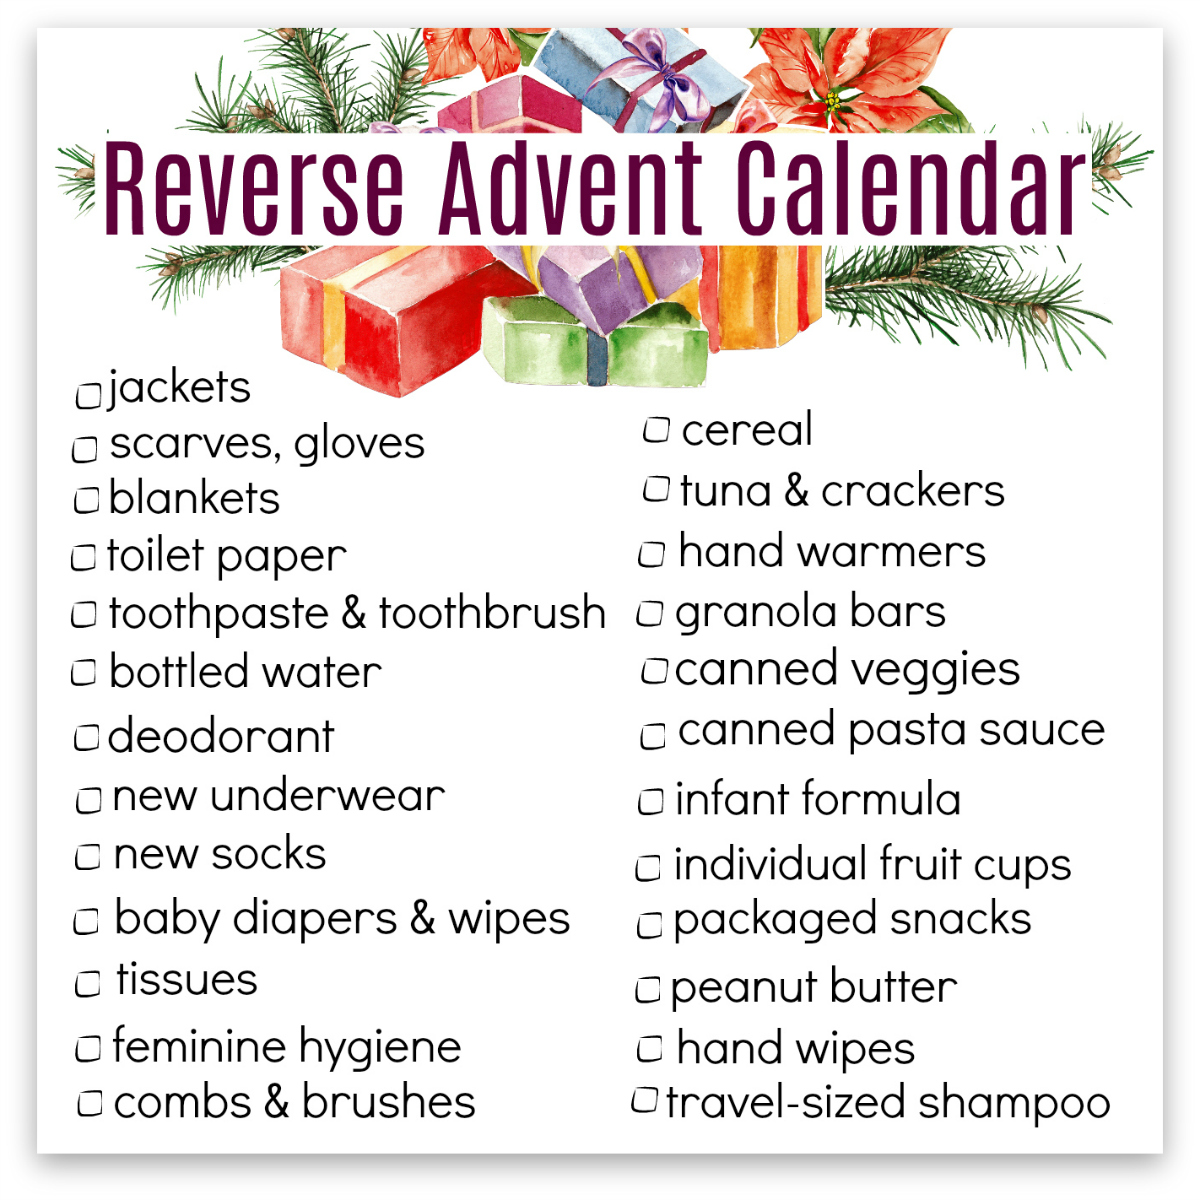 Reverse Advent Calendar - the PDF printable